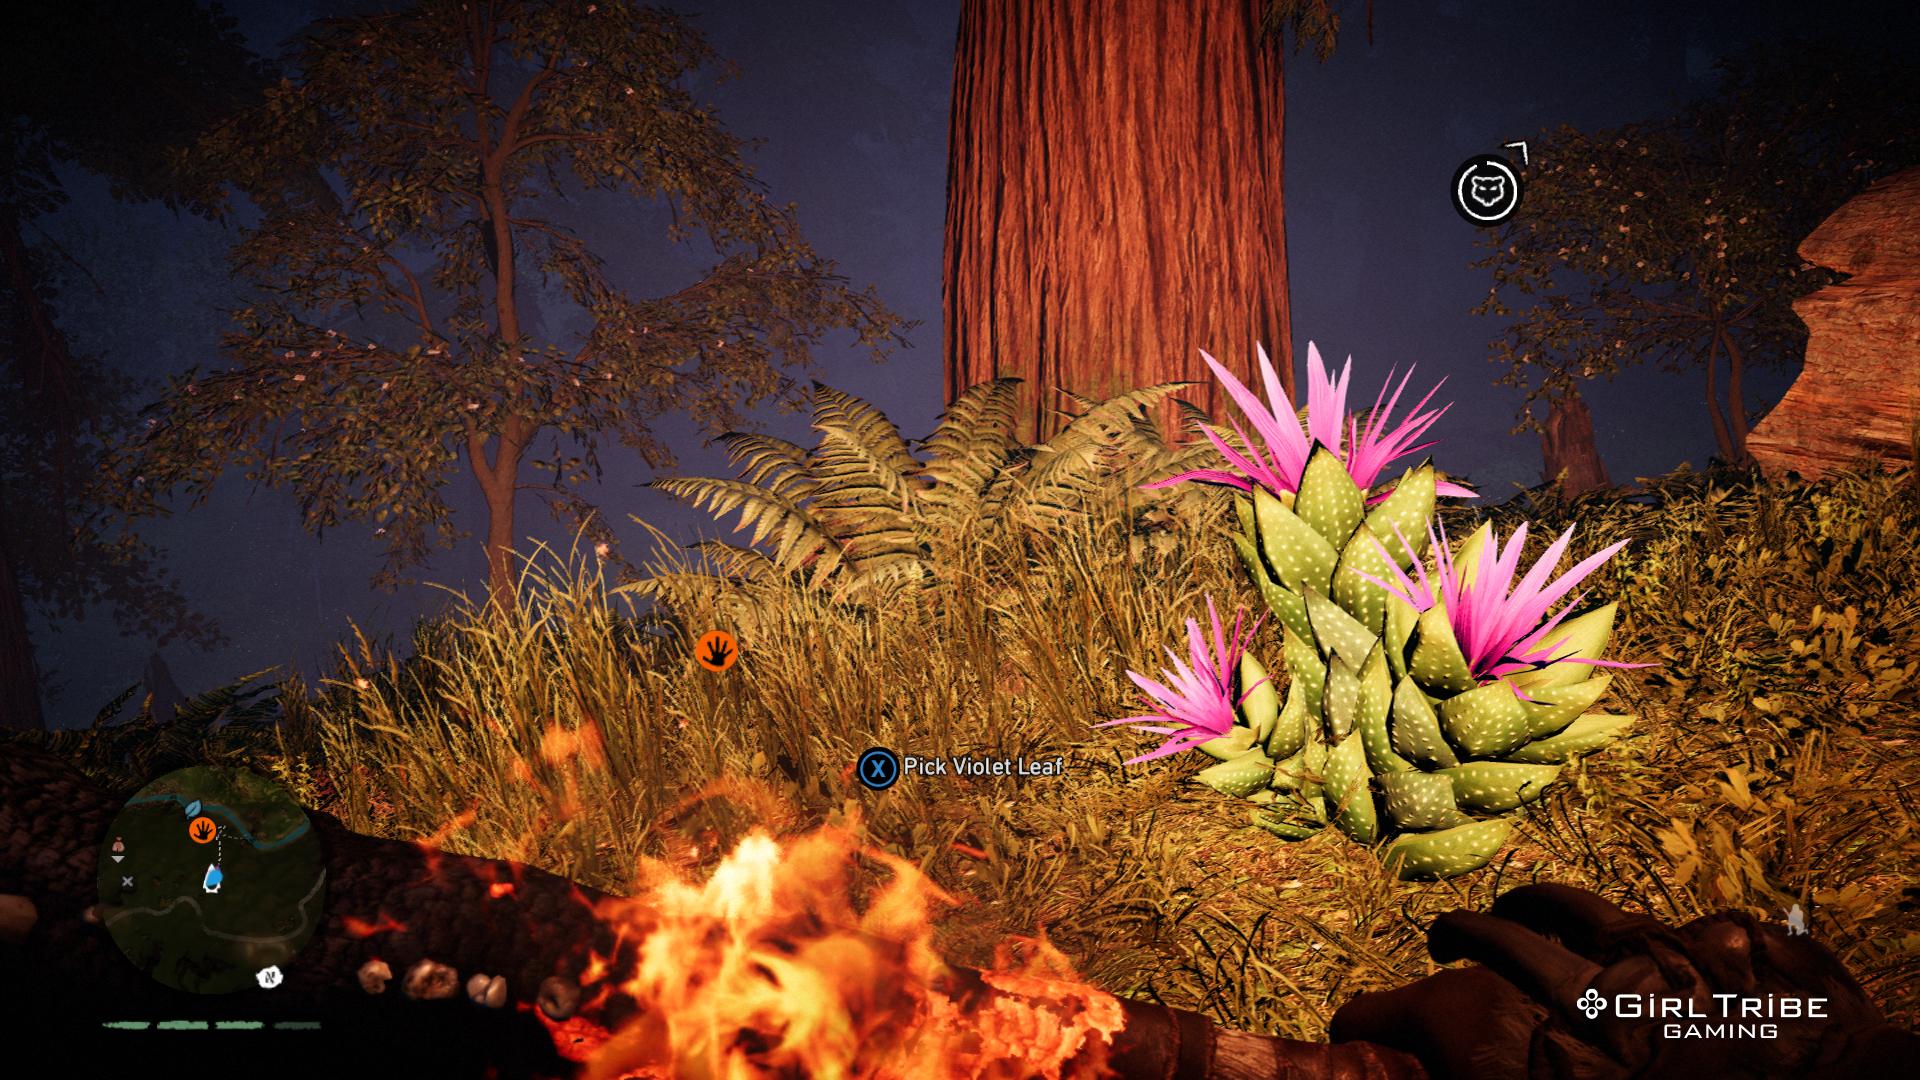 Far-Cry-Primal-Screenshot-7-w.jpg